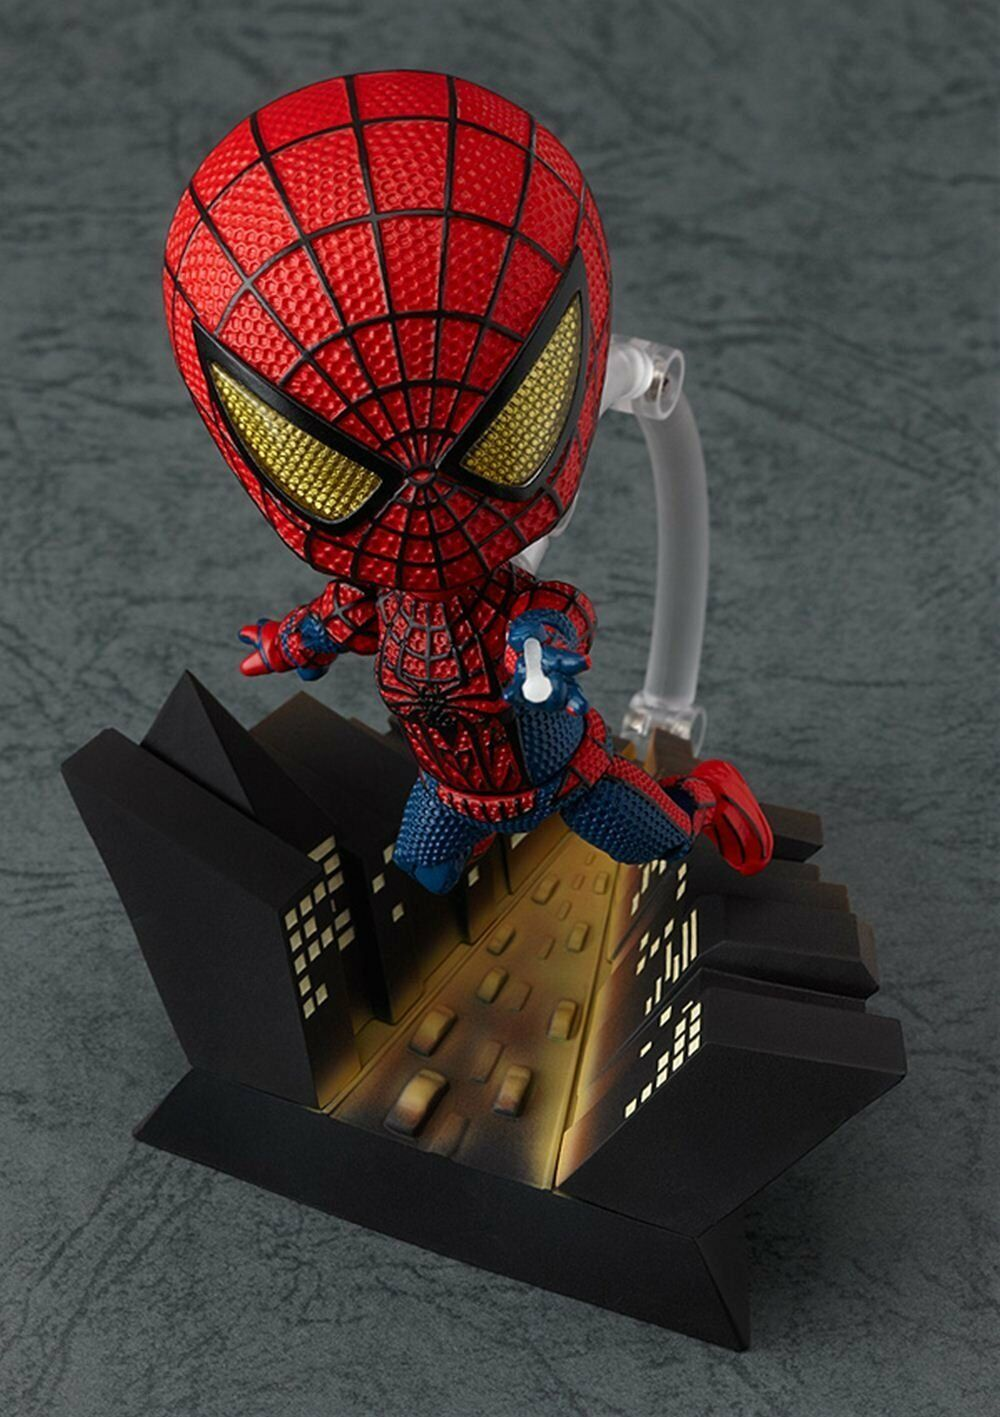 Nendoroid The Amazing Spider Man Spider-Man Hero's Edition Action Figure DC